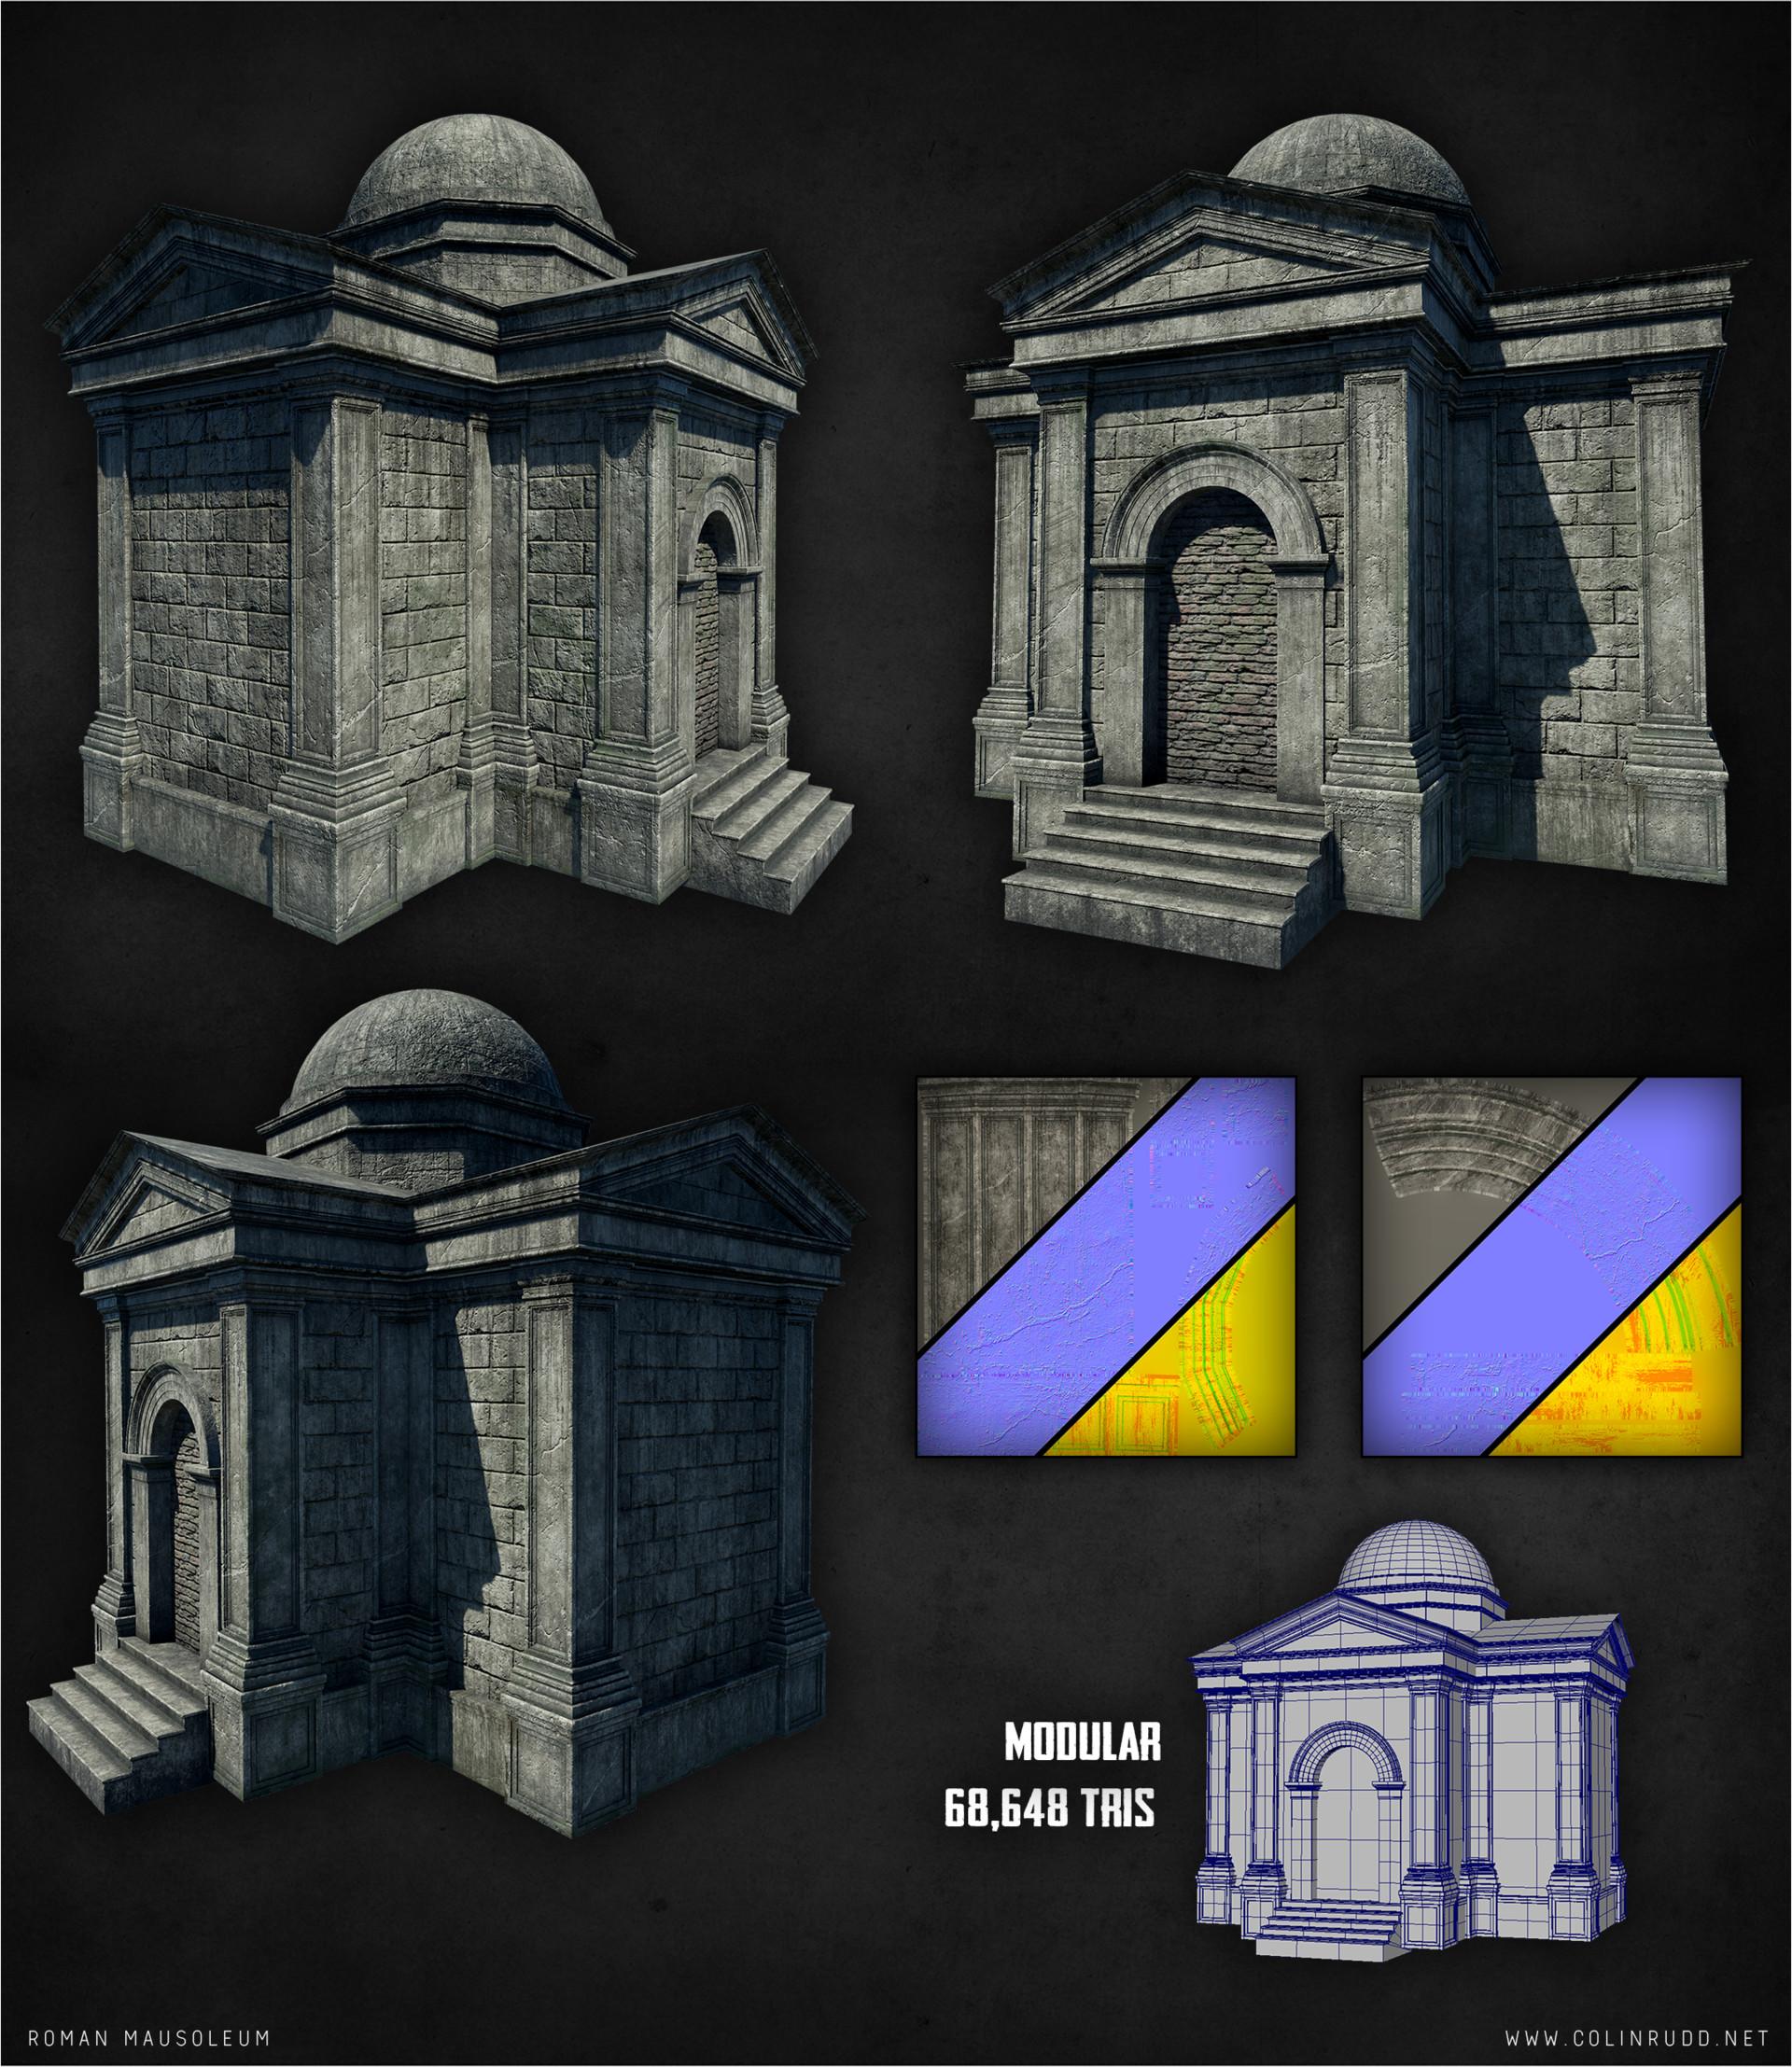 Colin rudd crypt